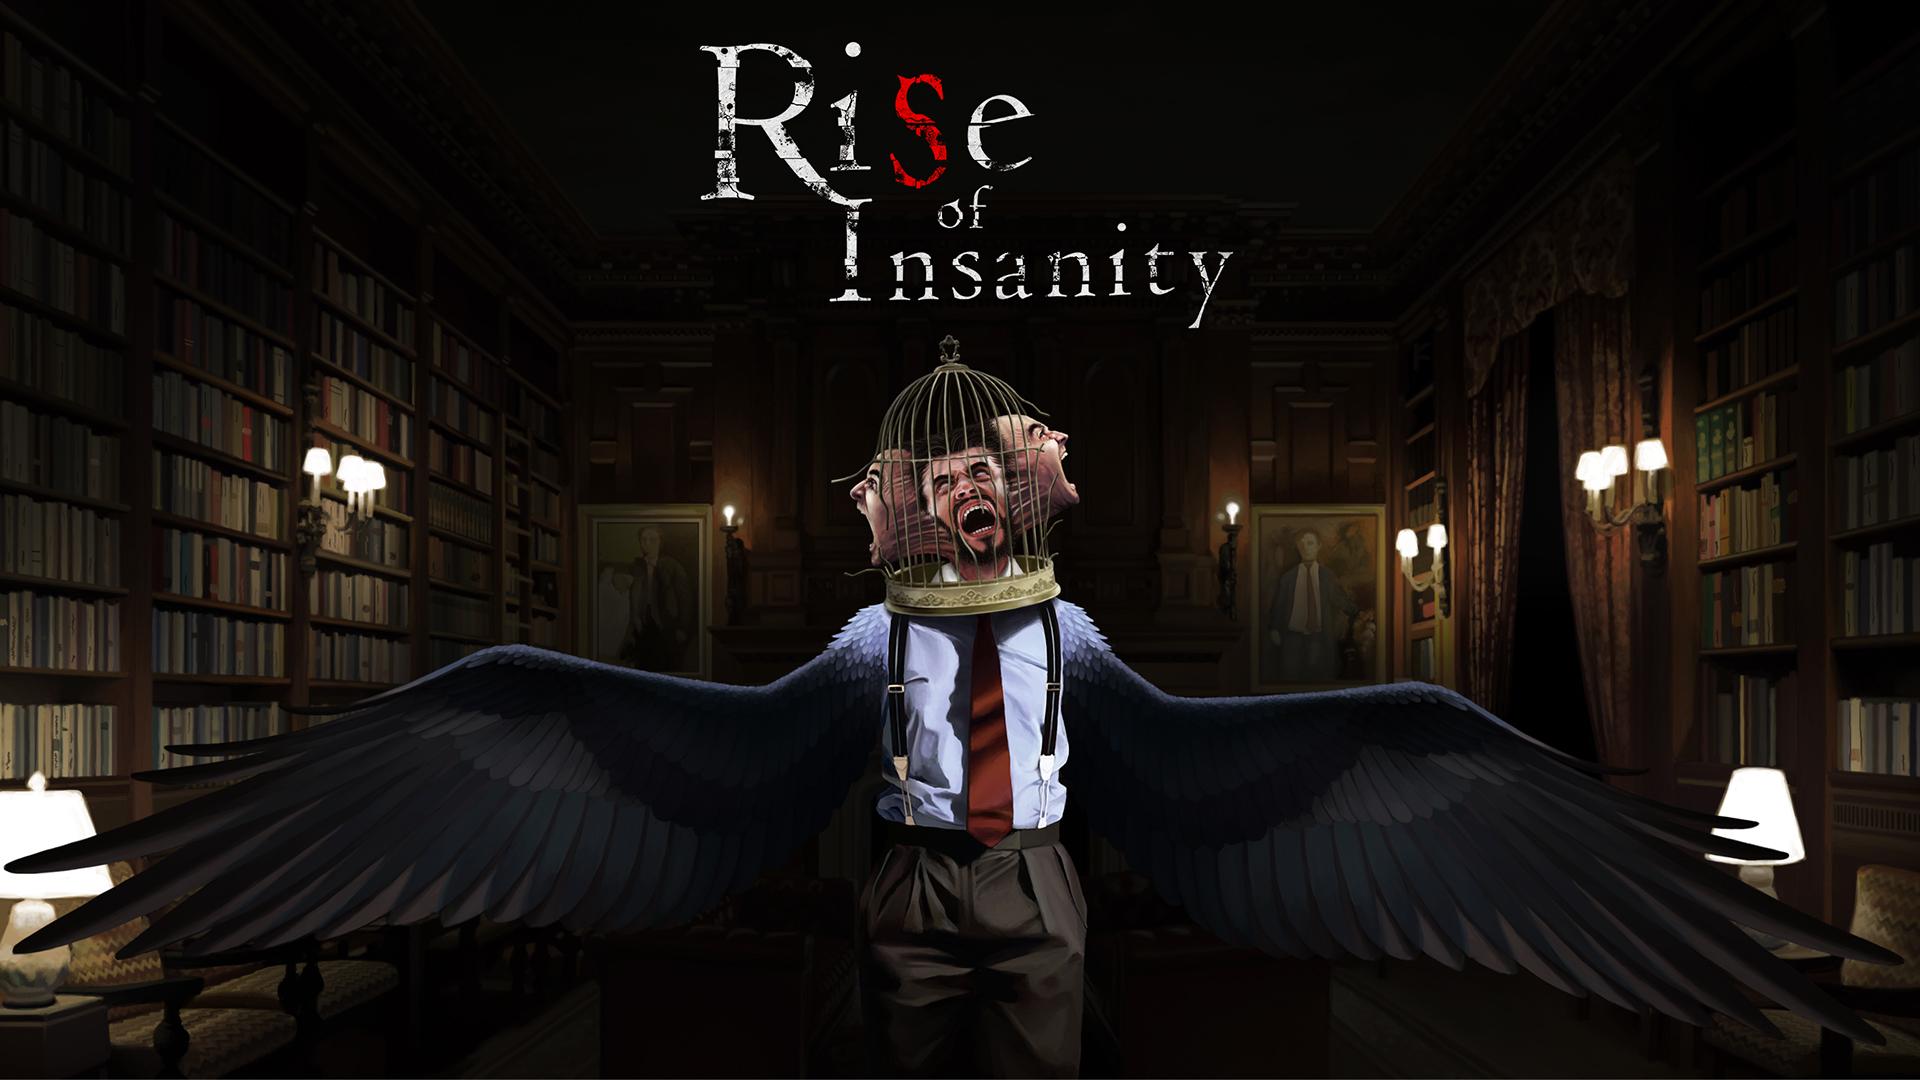 RiseofInsanity_coverart